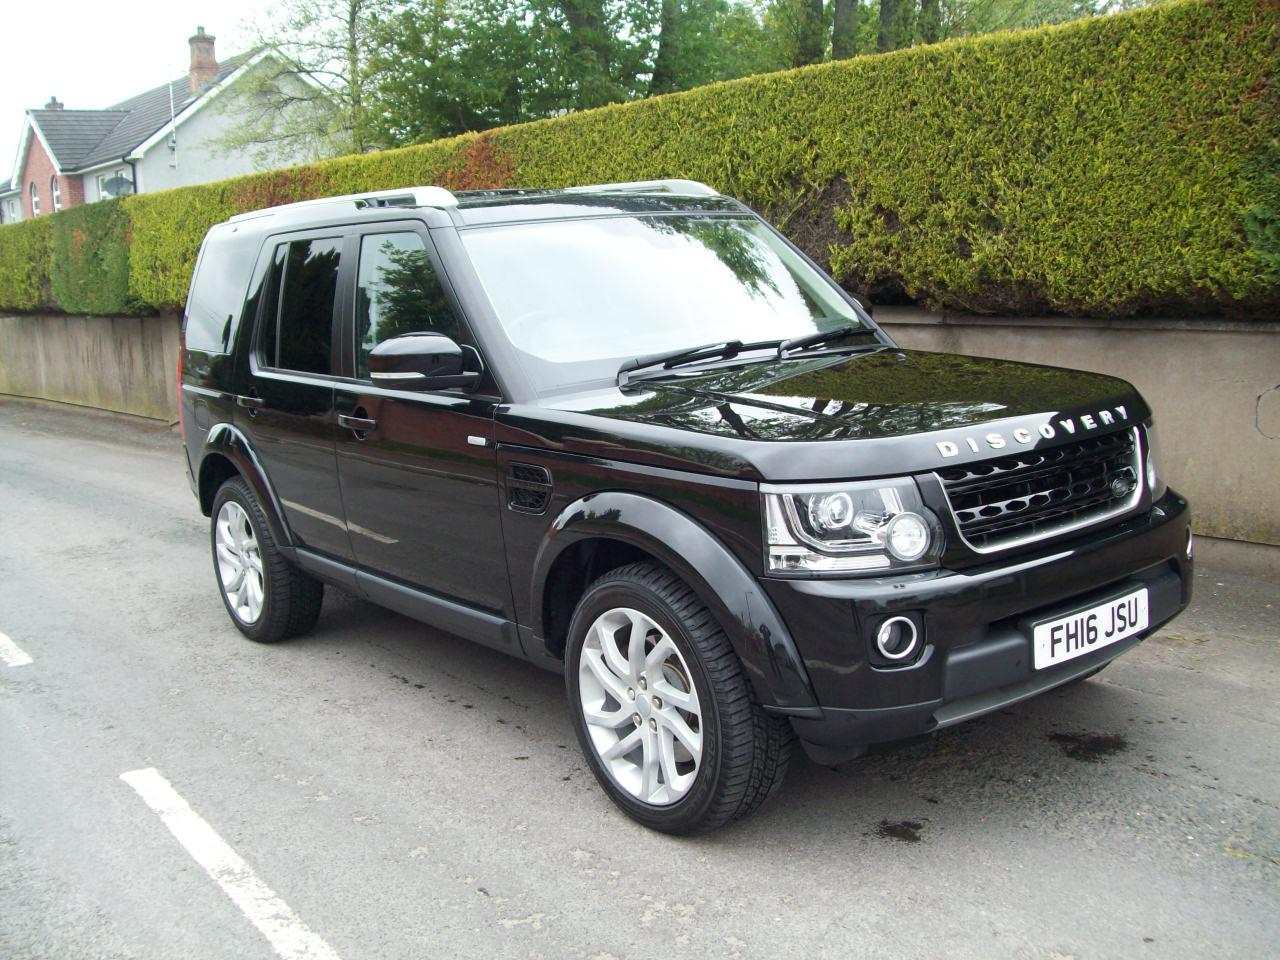 Used Cars For Sale At Derek Loane Motors Car Dealer Based In